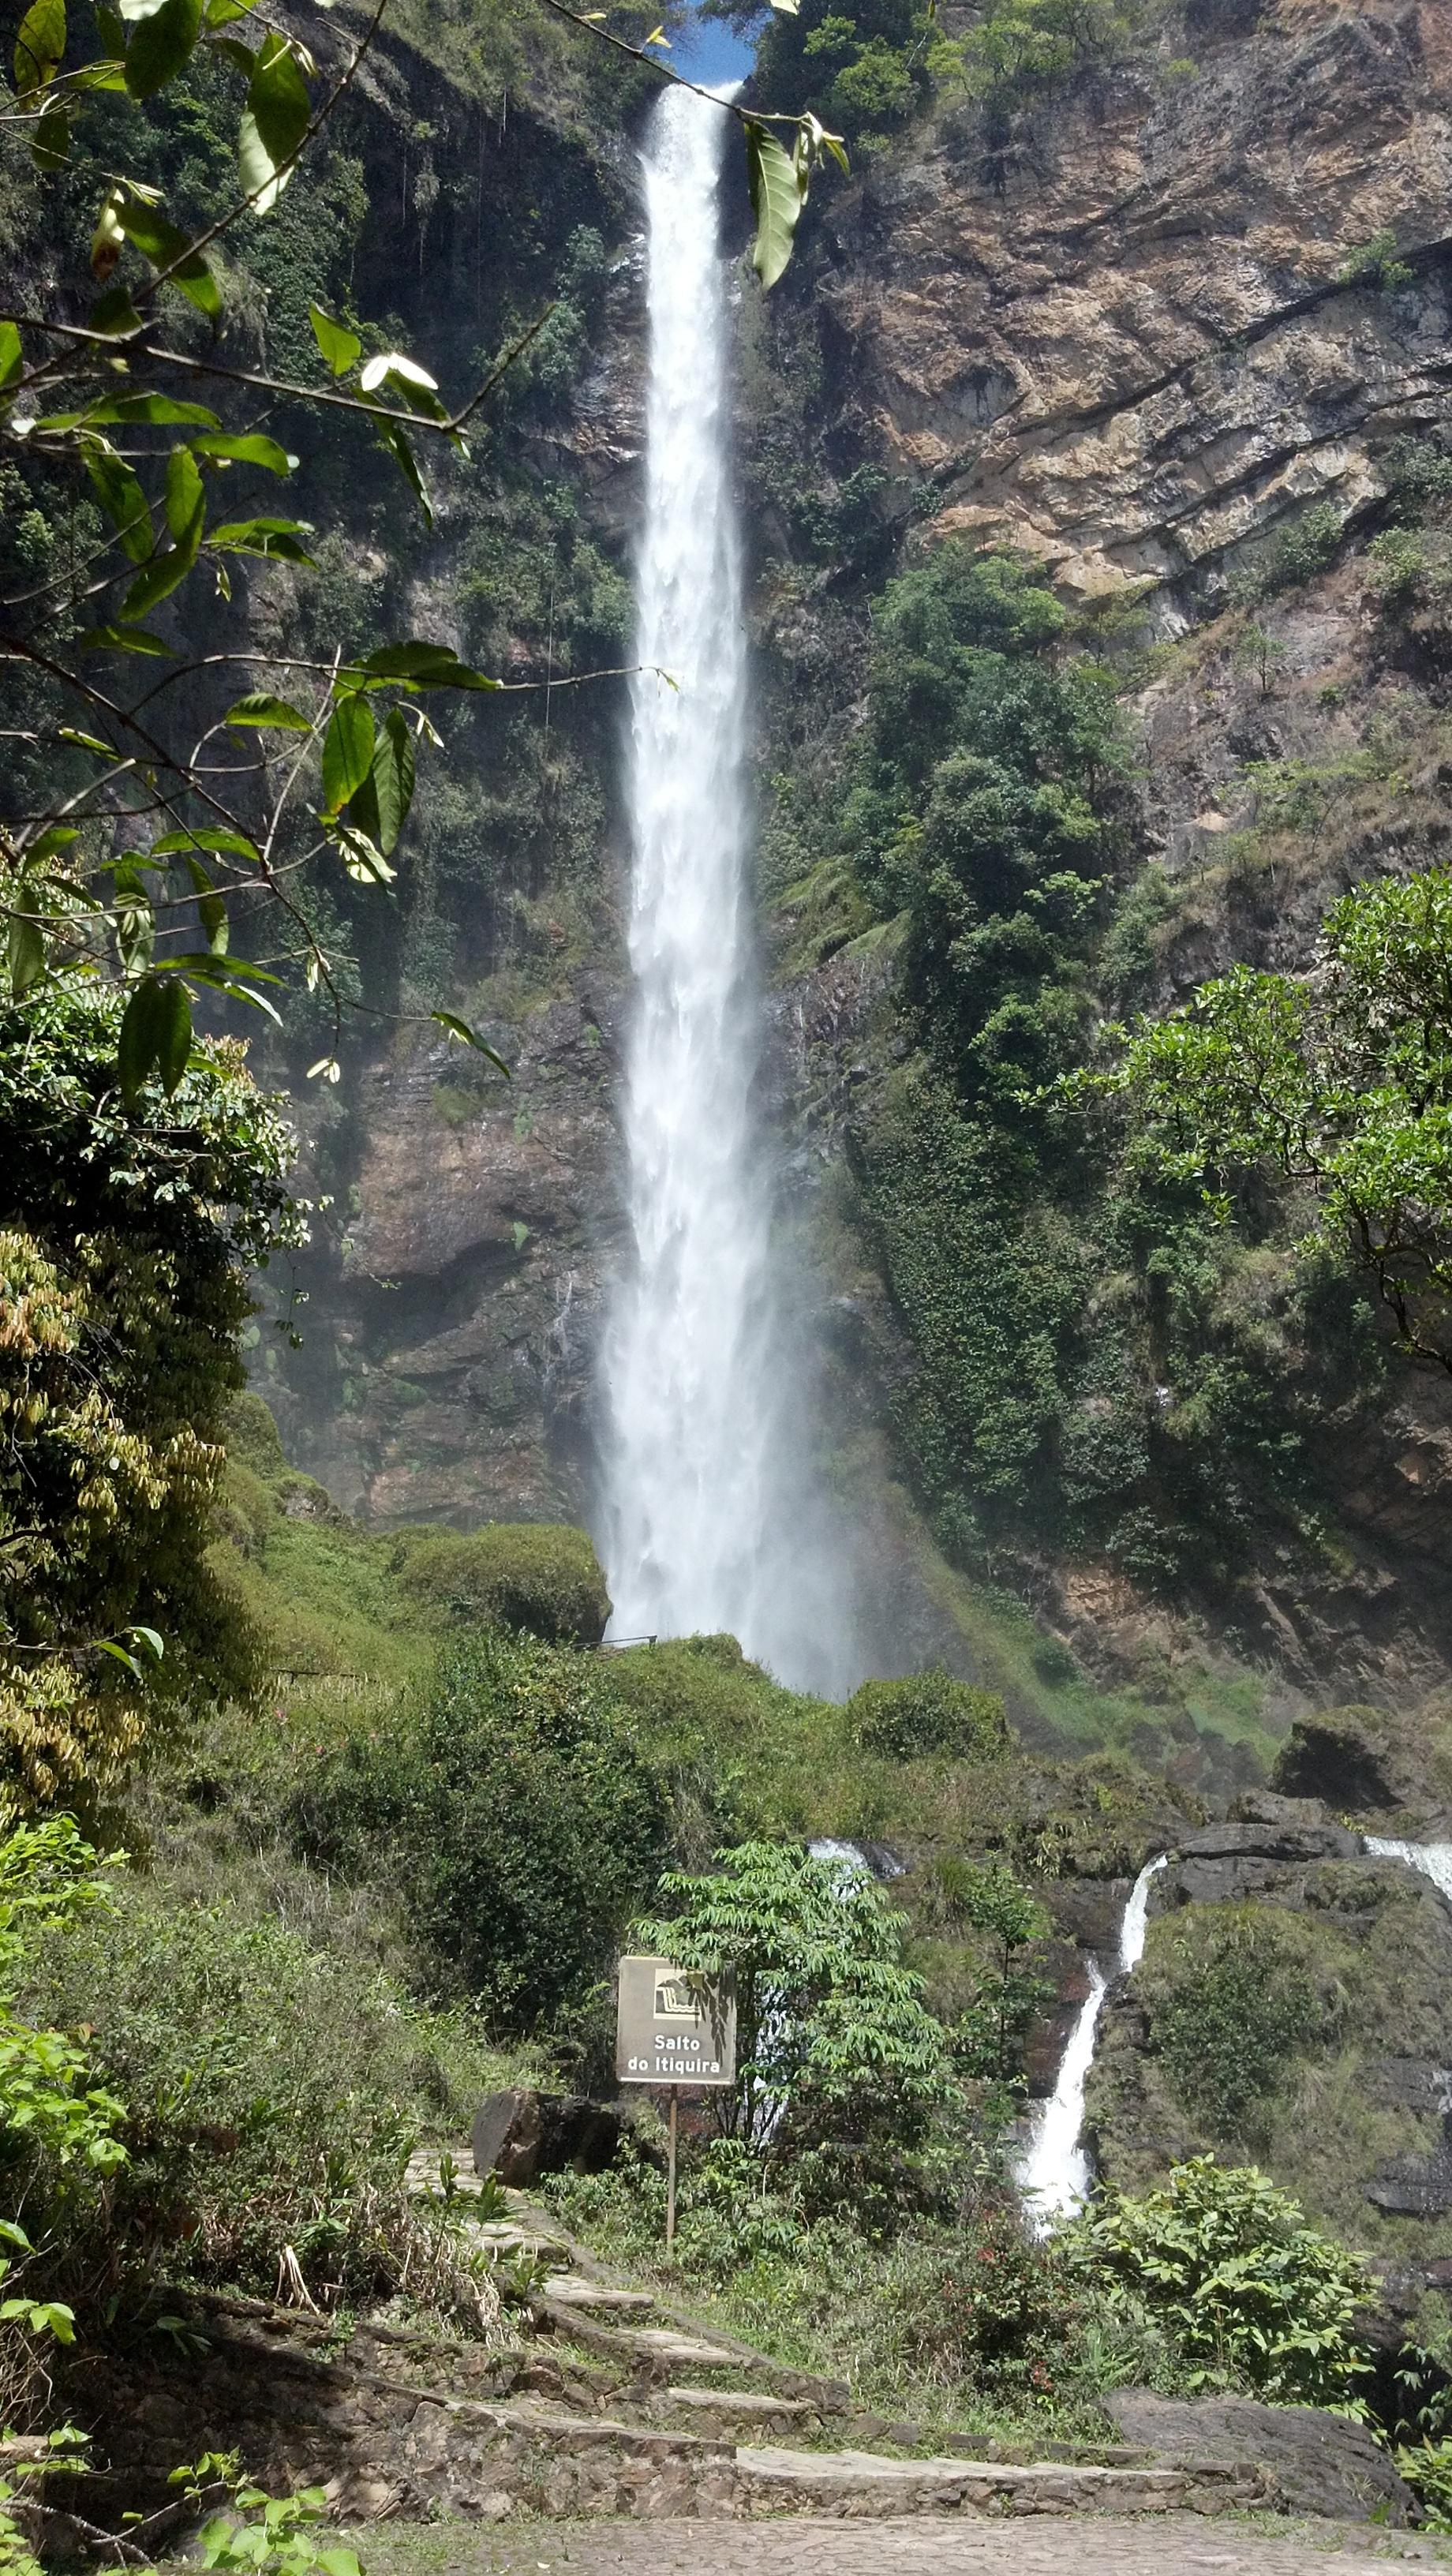 Fotos gratis cascada cuerpo de agua selva paisajes - Fuentes de cascada ...